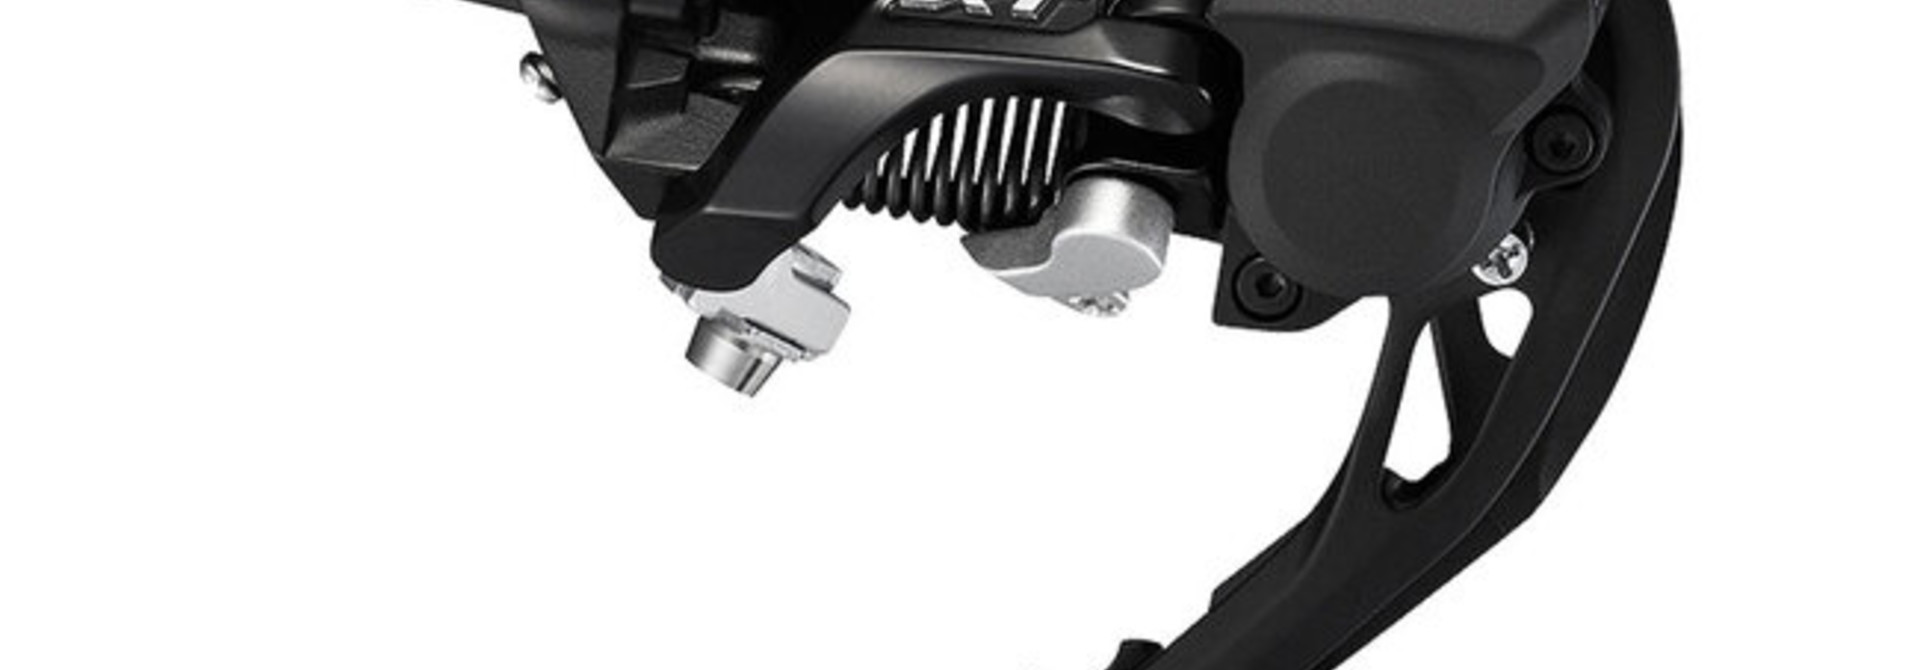 Shimano XT Rear Derailleur RD-M786 10sp Black GS